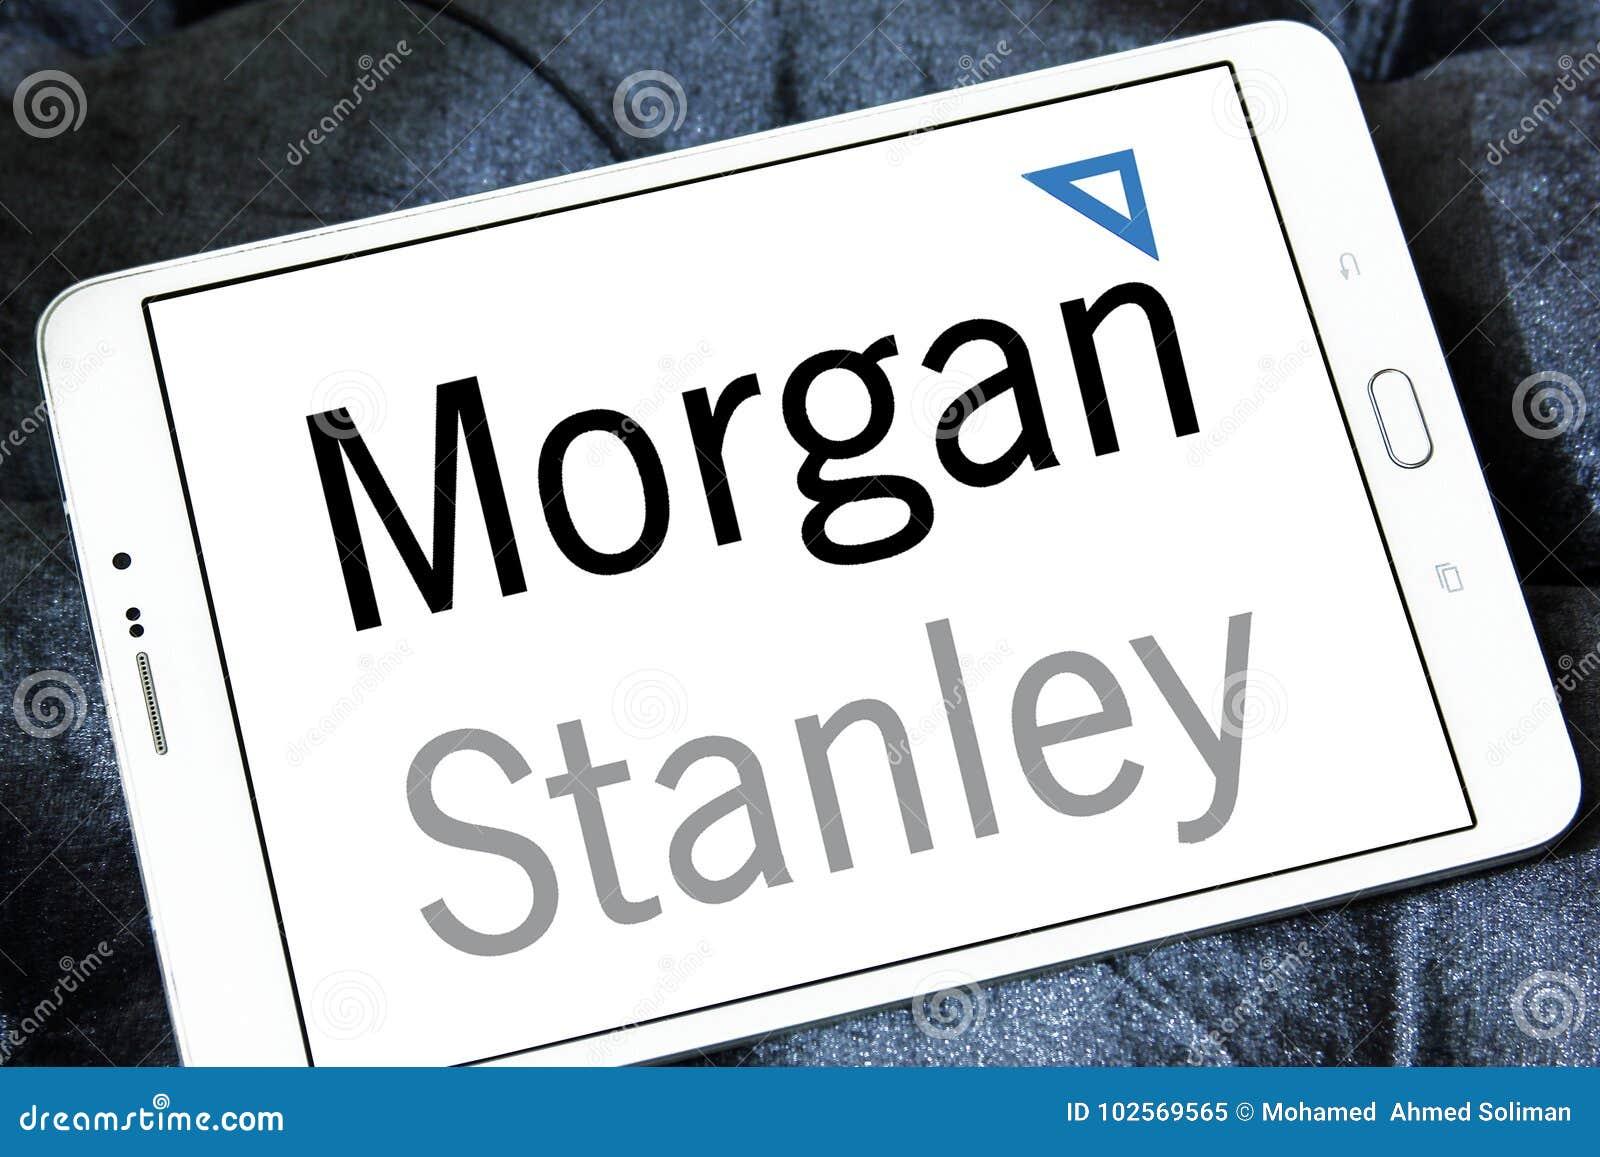 Morgan Stanley logo editorial image  Image of logo, icons